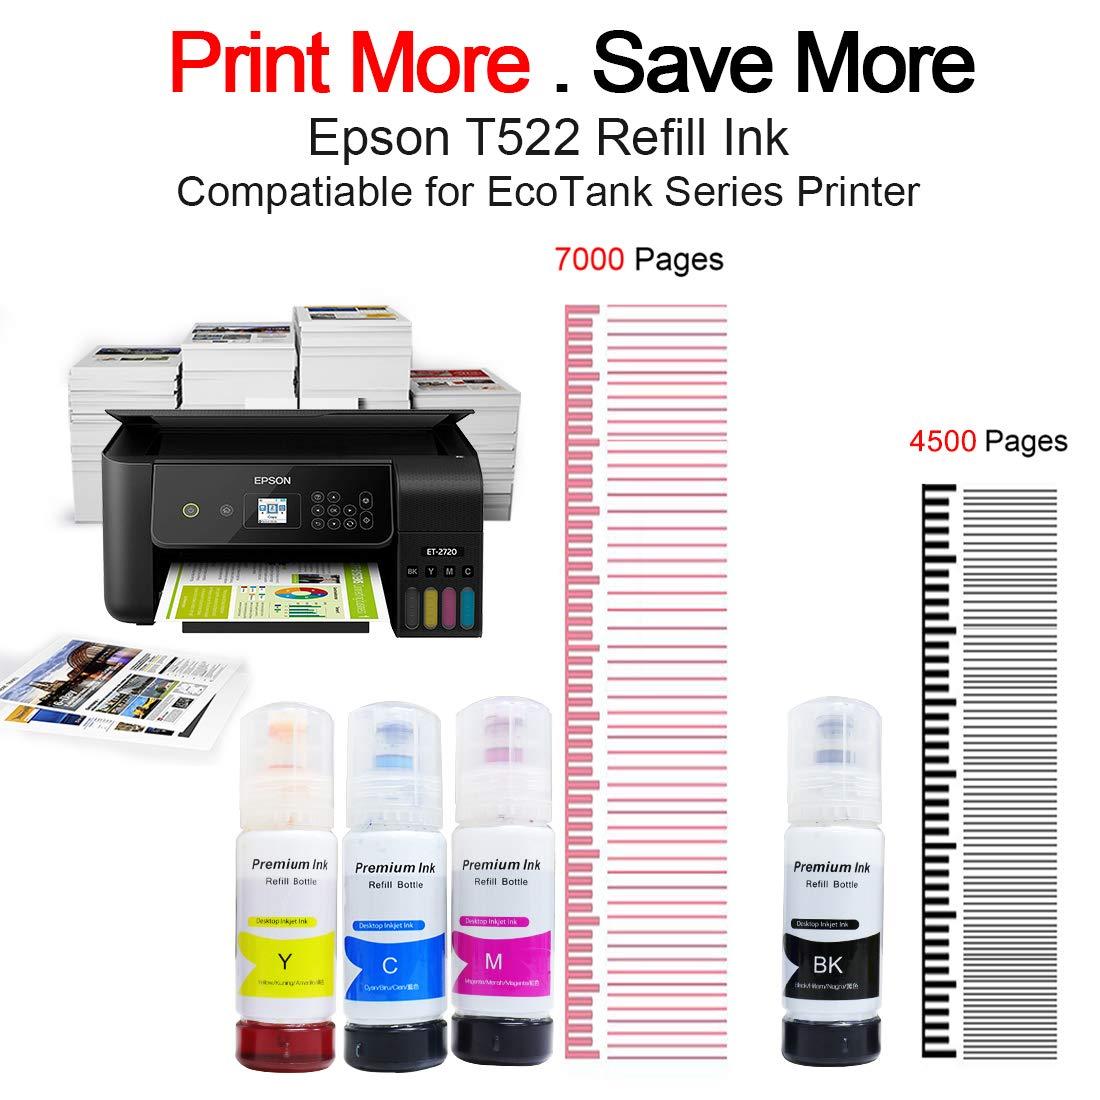 Printers Jack Compatiable Epson T522 Refill Ink Bottle Kit For Epson Ecotank Et 2720 Et 4700 Regular Refilled T522 Ink Amazon Sg Electronics